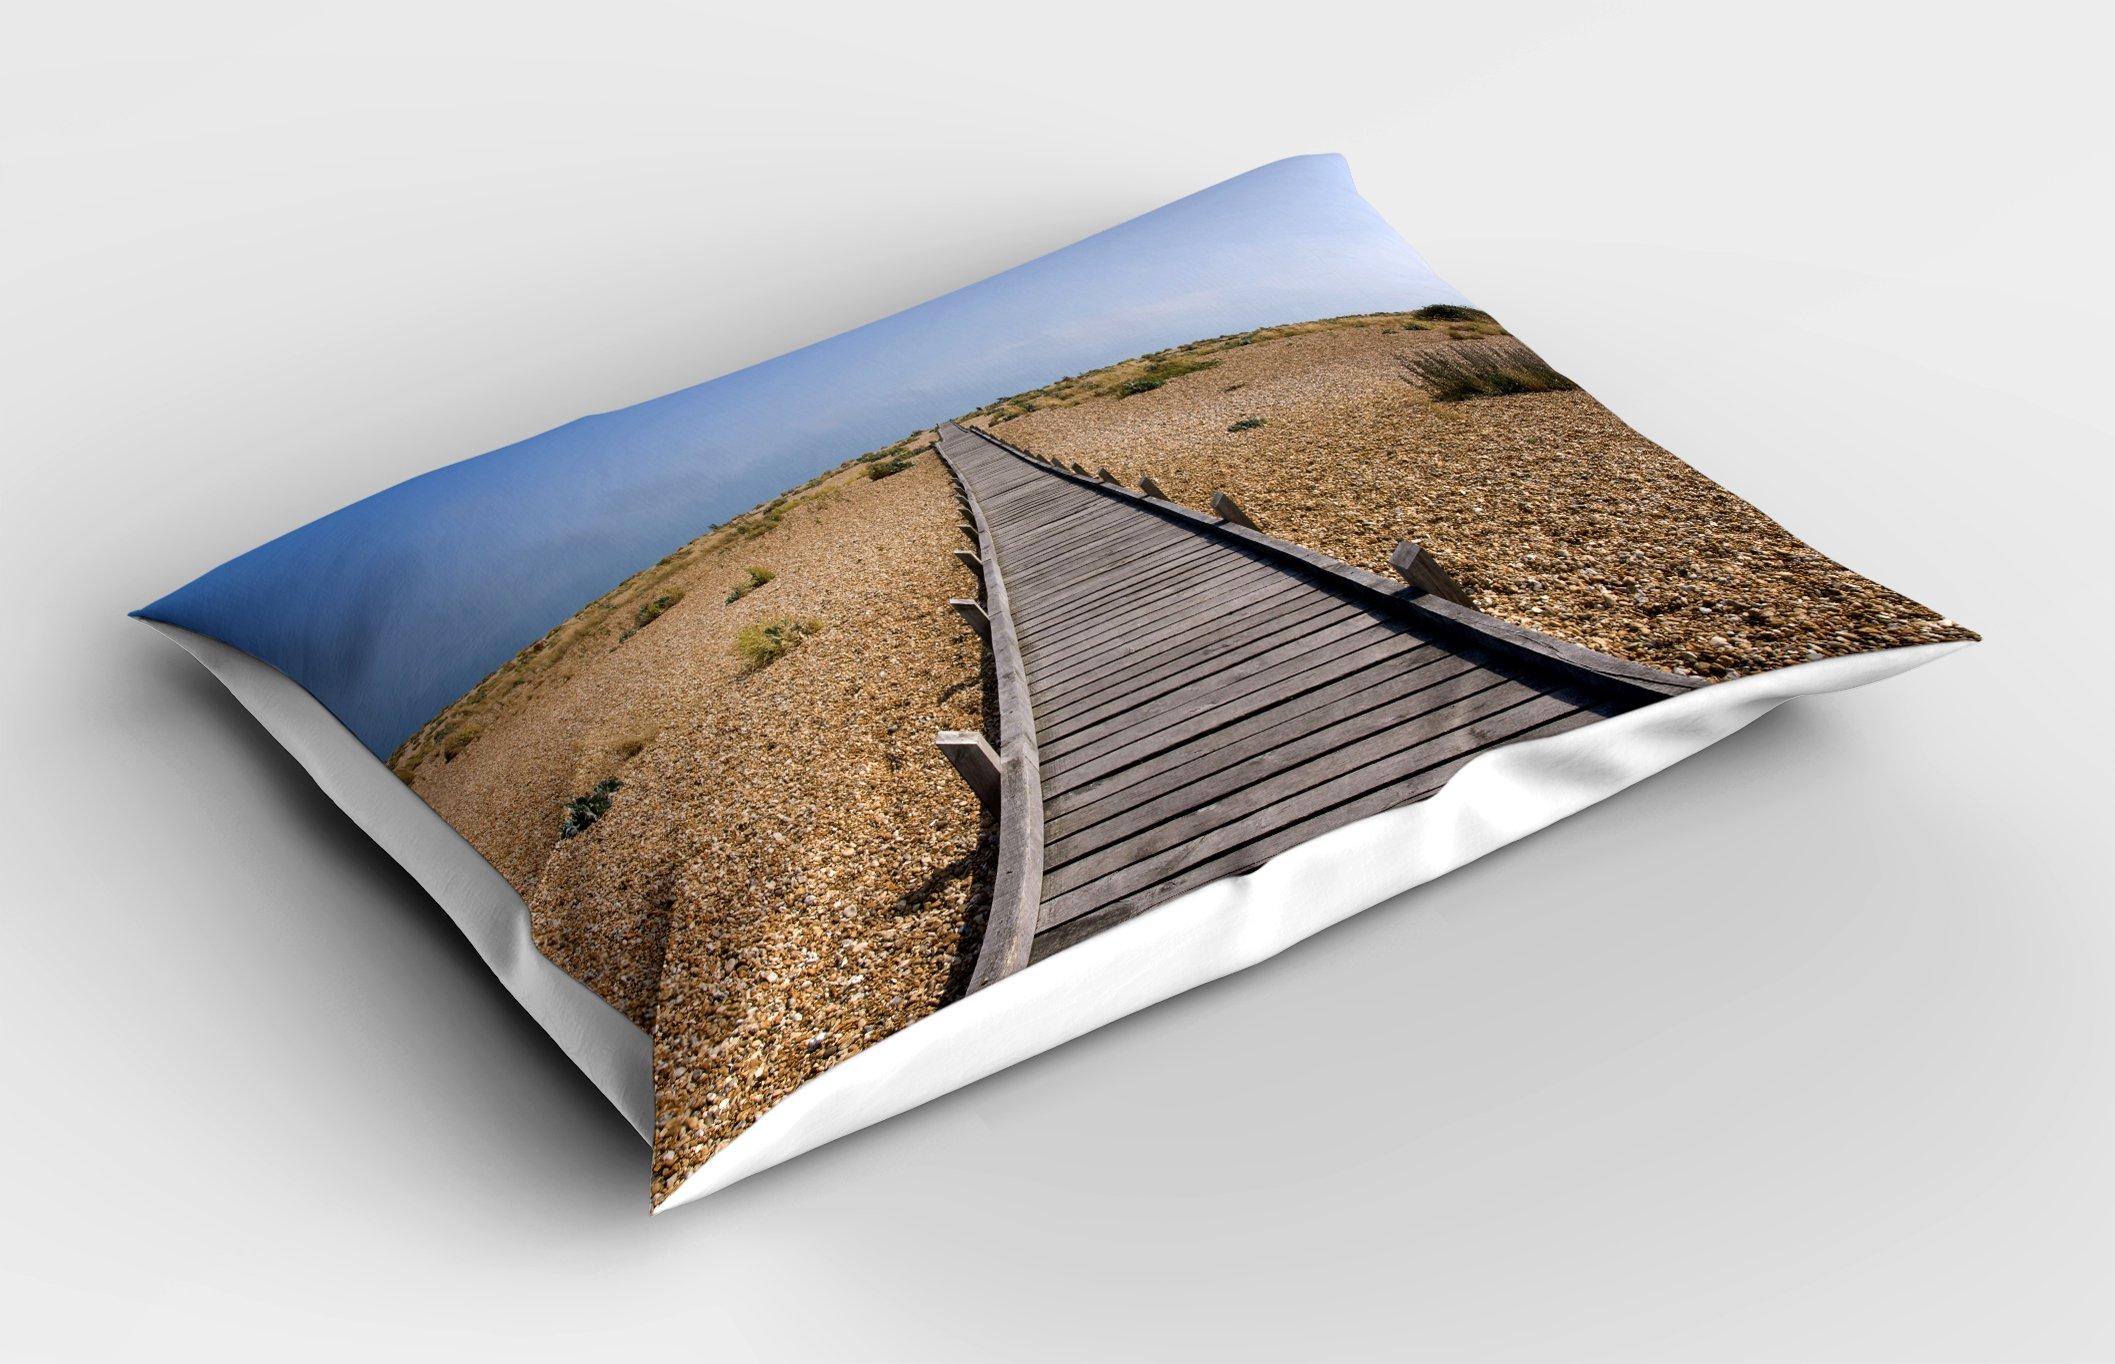 Lunarable Beach Pillow Sham, Raised Wood Boardwalk Across a Pebble Coastline Stone Endless Road Nature Theme, Decorative Standard King Size Printed Pillowcase, 36 X 20 inches, Blue Brown Cream by Lunarable (Image #2)